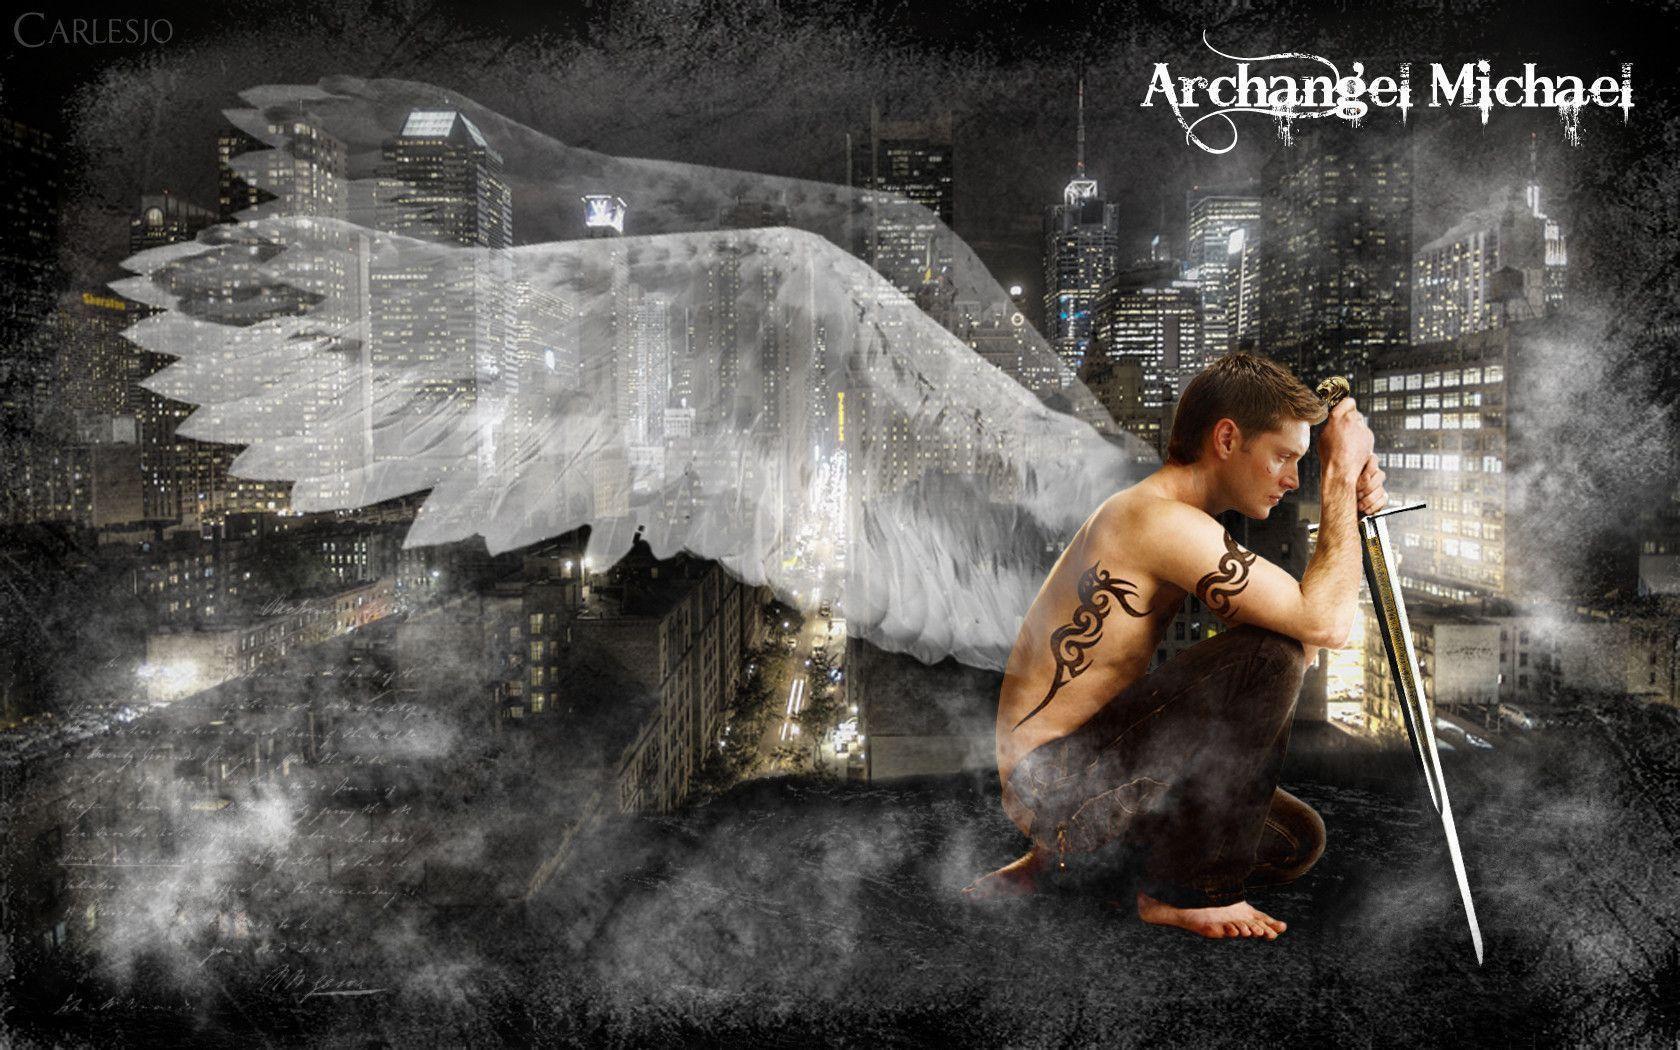 archangel michael wallpaper for computer - photo #13